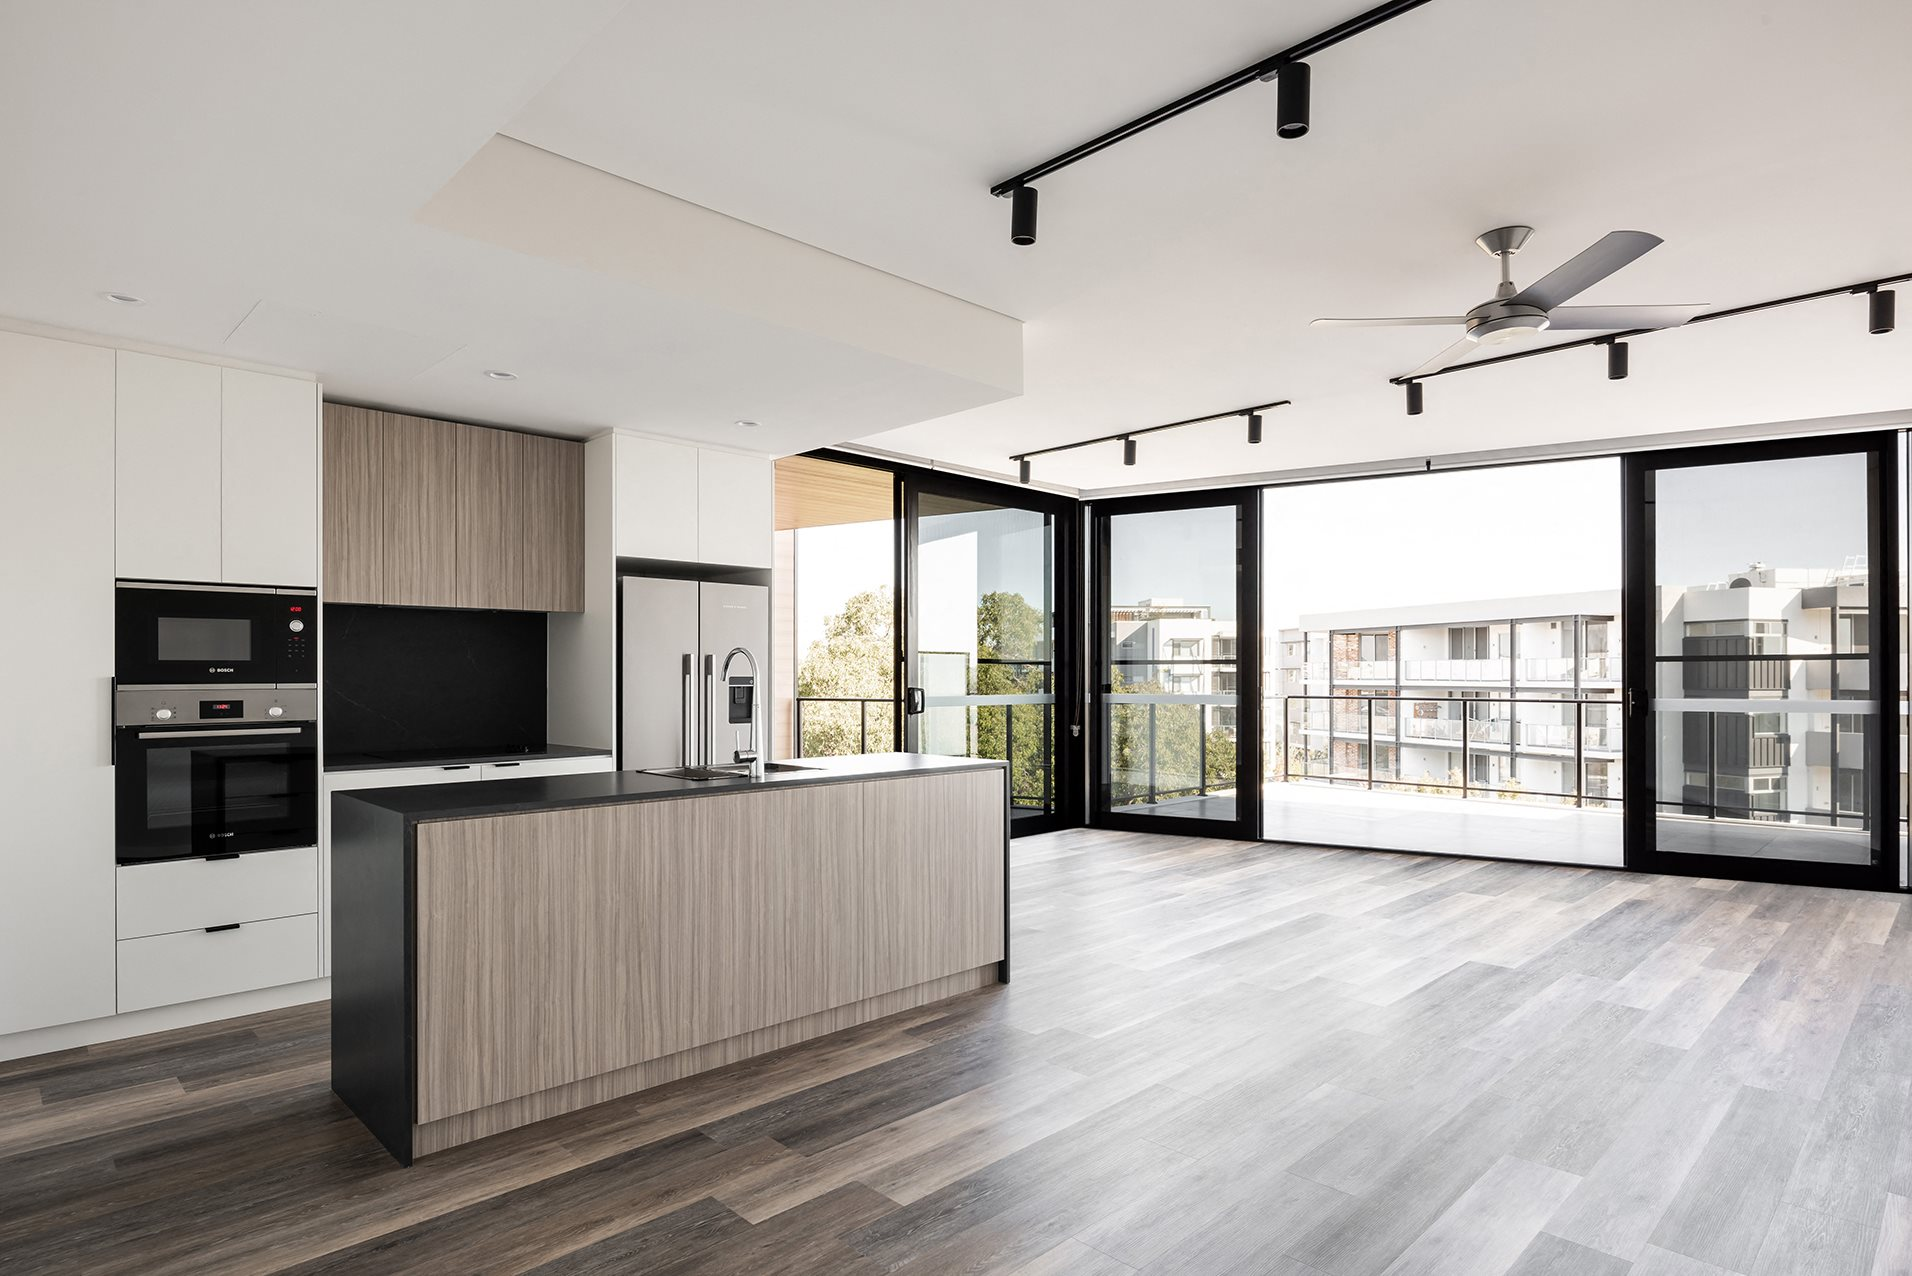 Element 27 apartments